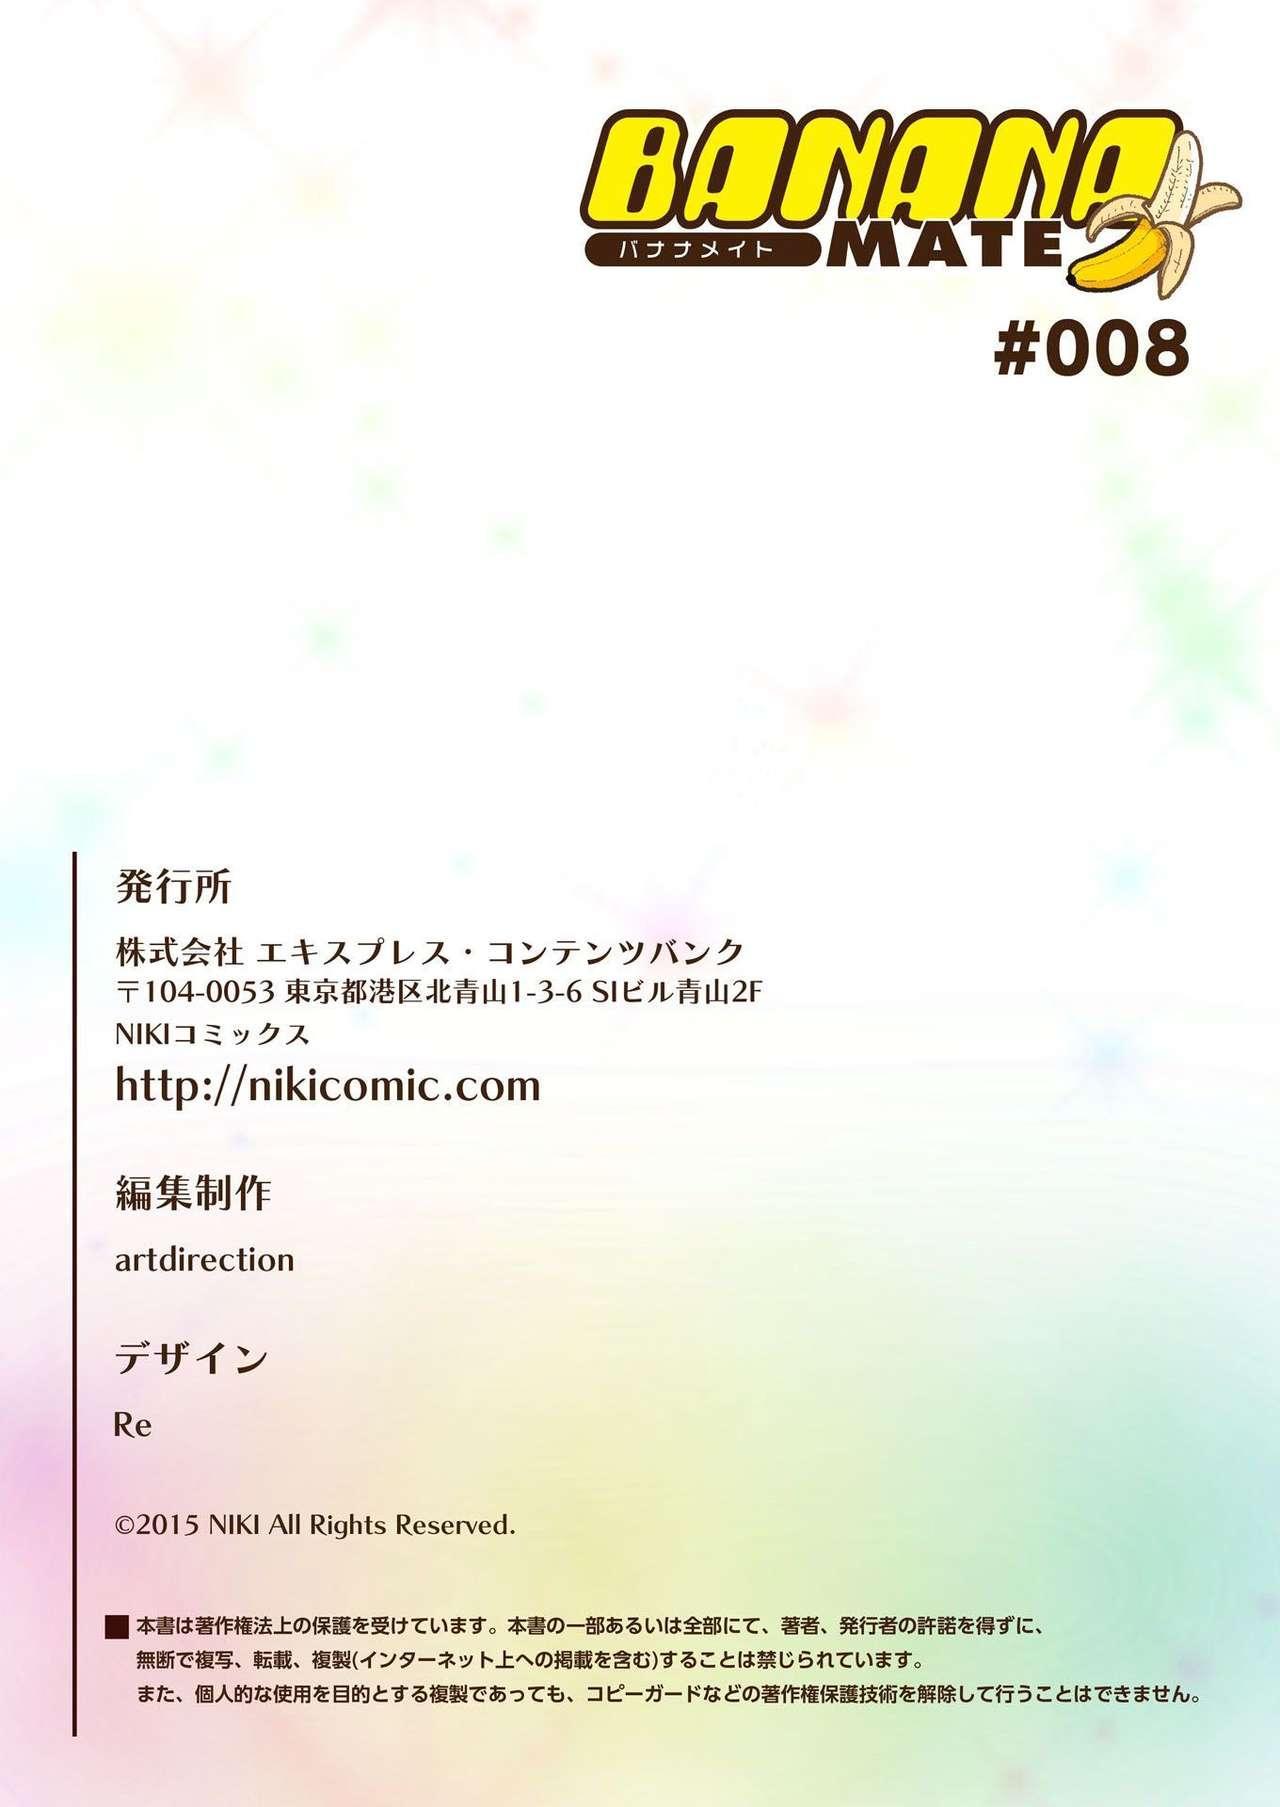 BANANAMATE Vol. 8 252